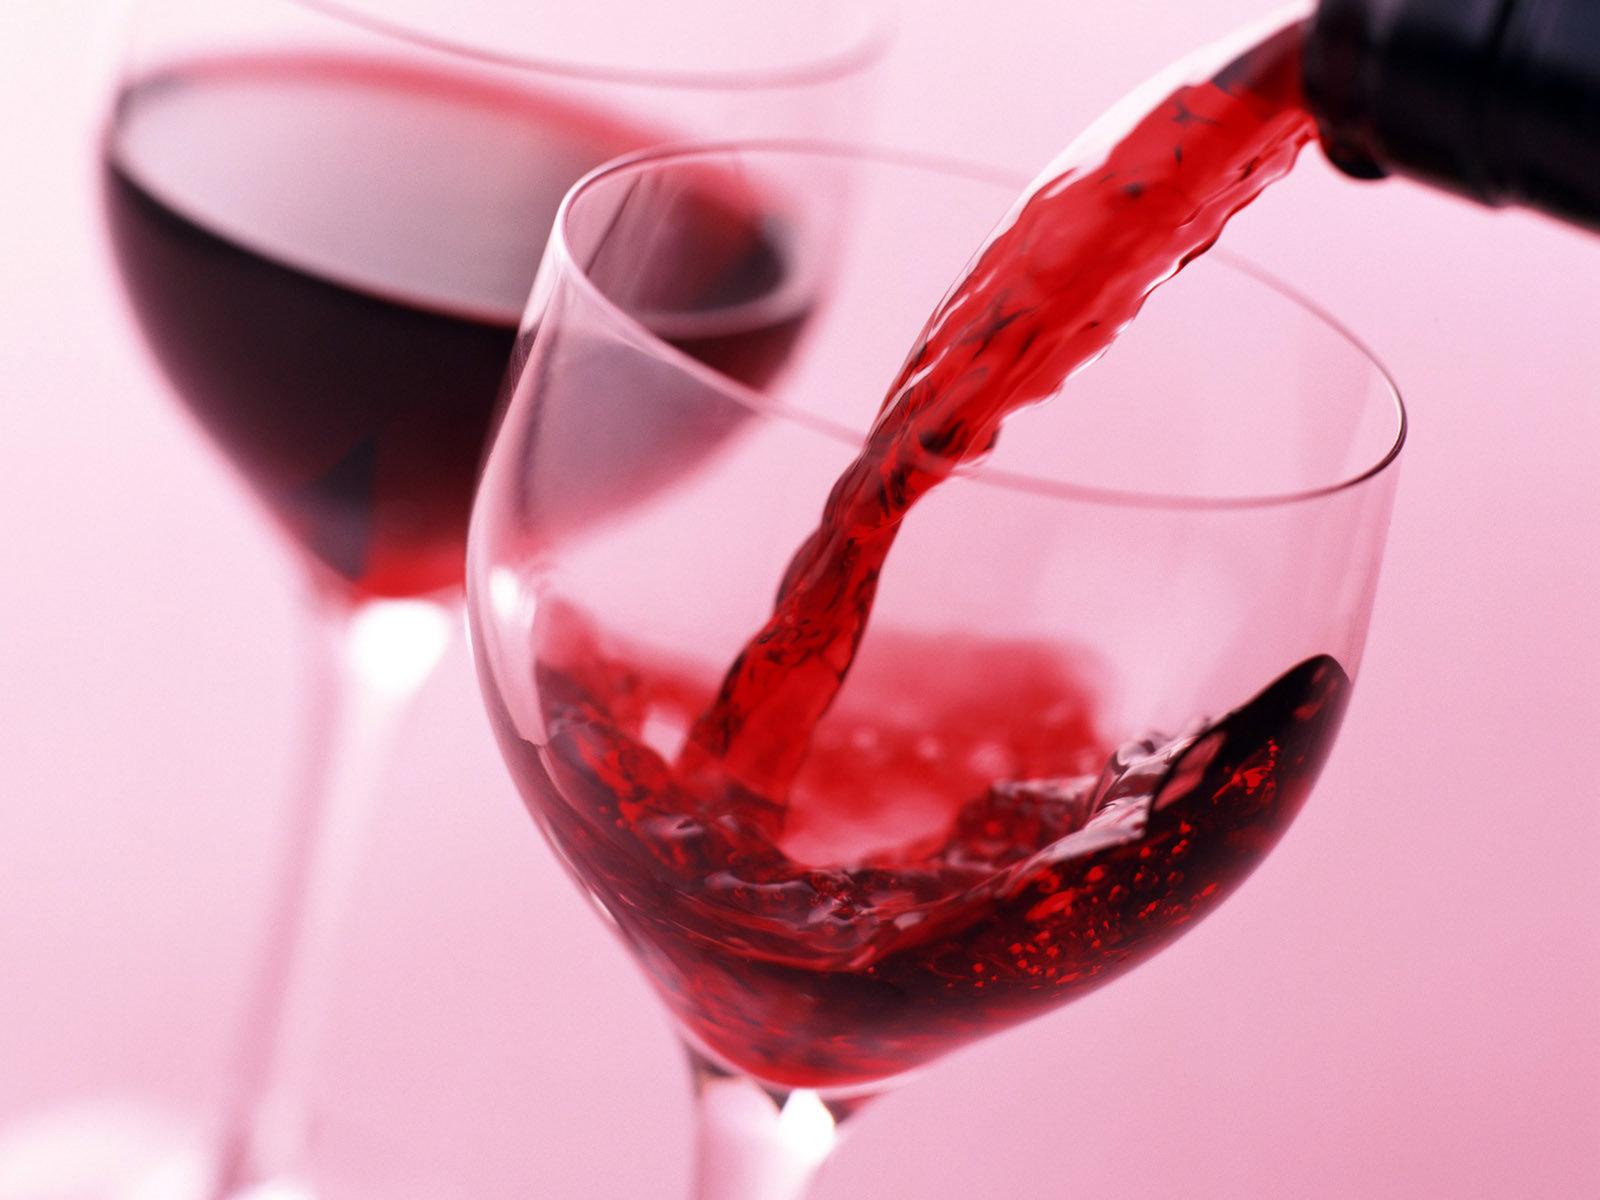 Image result for रेड वाइन पीते हैं तो जरा एक नजर यहाँ भी